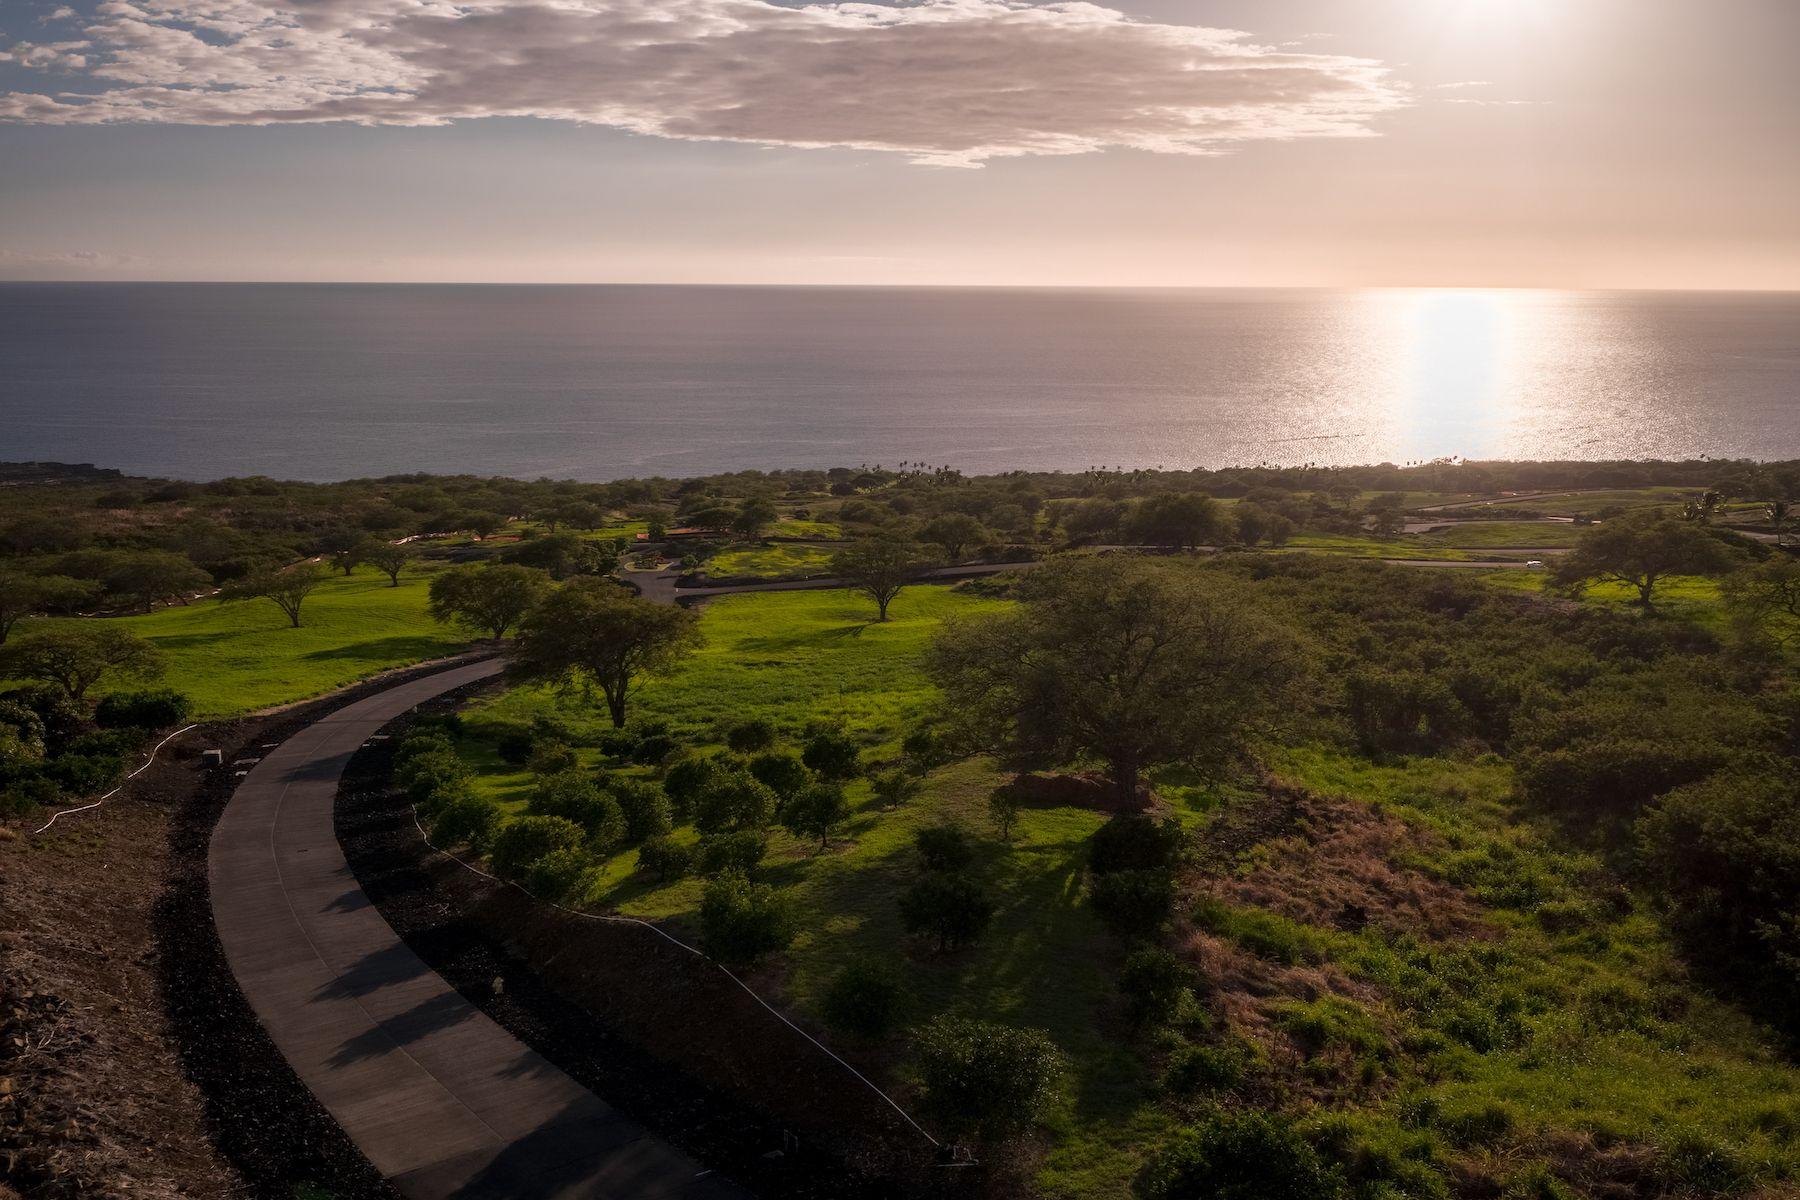 Land for Sale at 81-497 Palena Place, Kealakekua, HI 96750 81-497 Palena Place Kealakekua, Hawaii 96750 United States